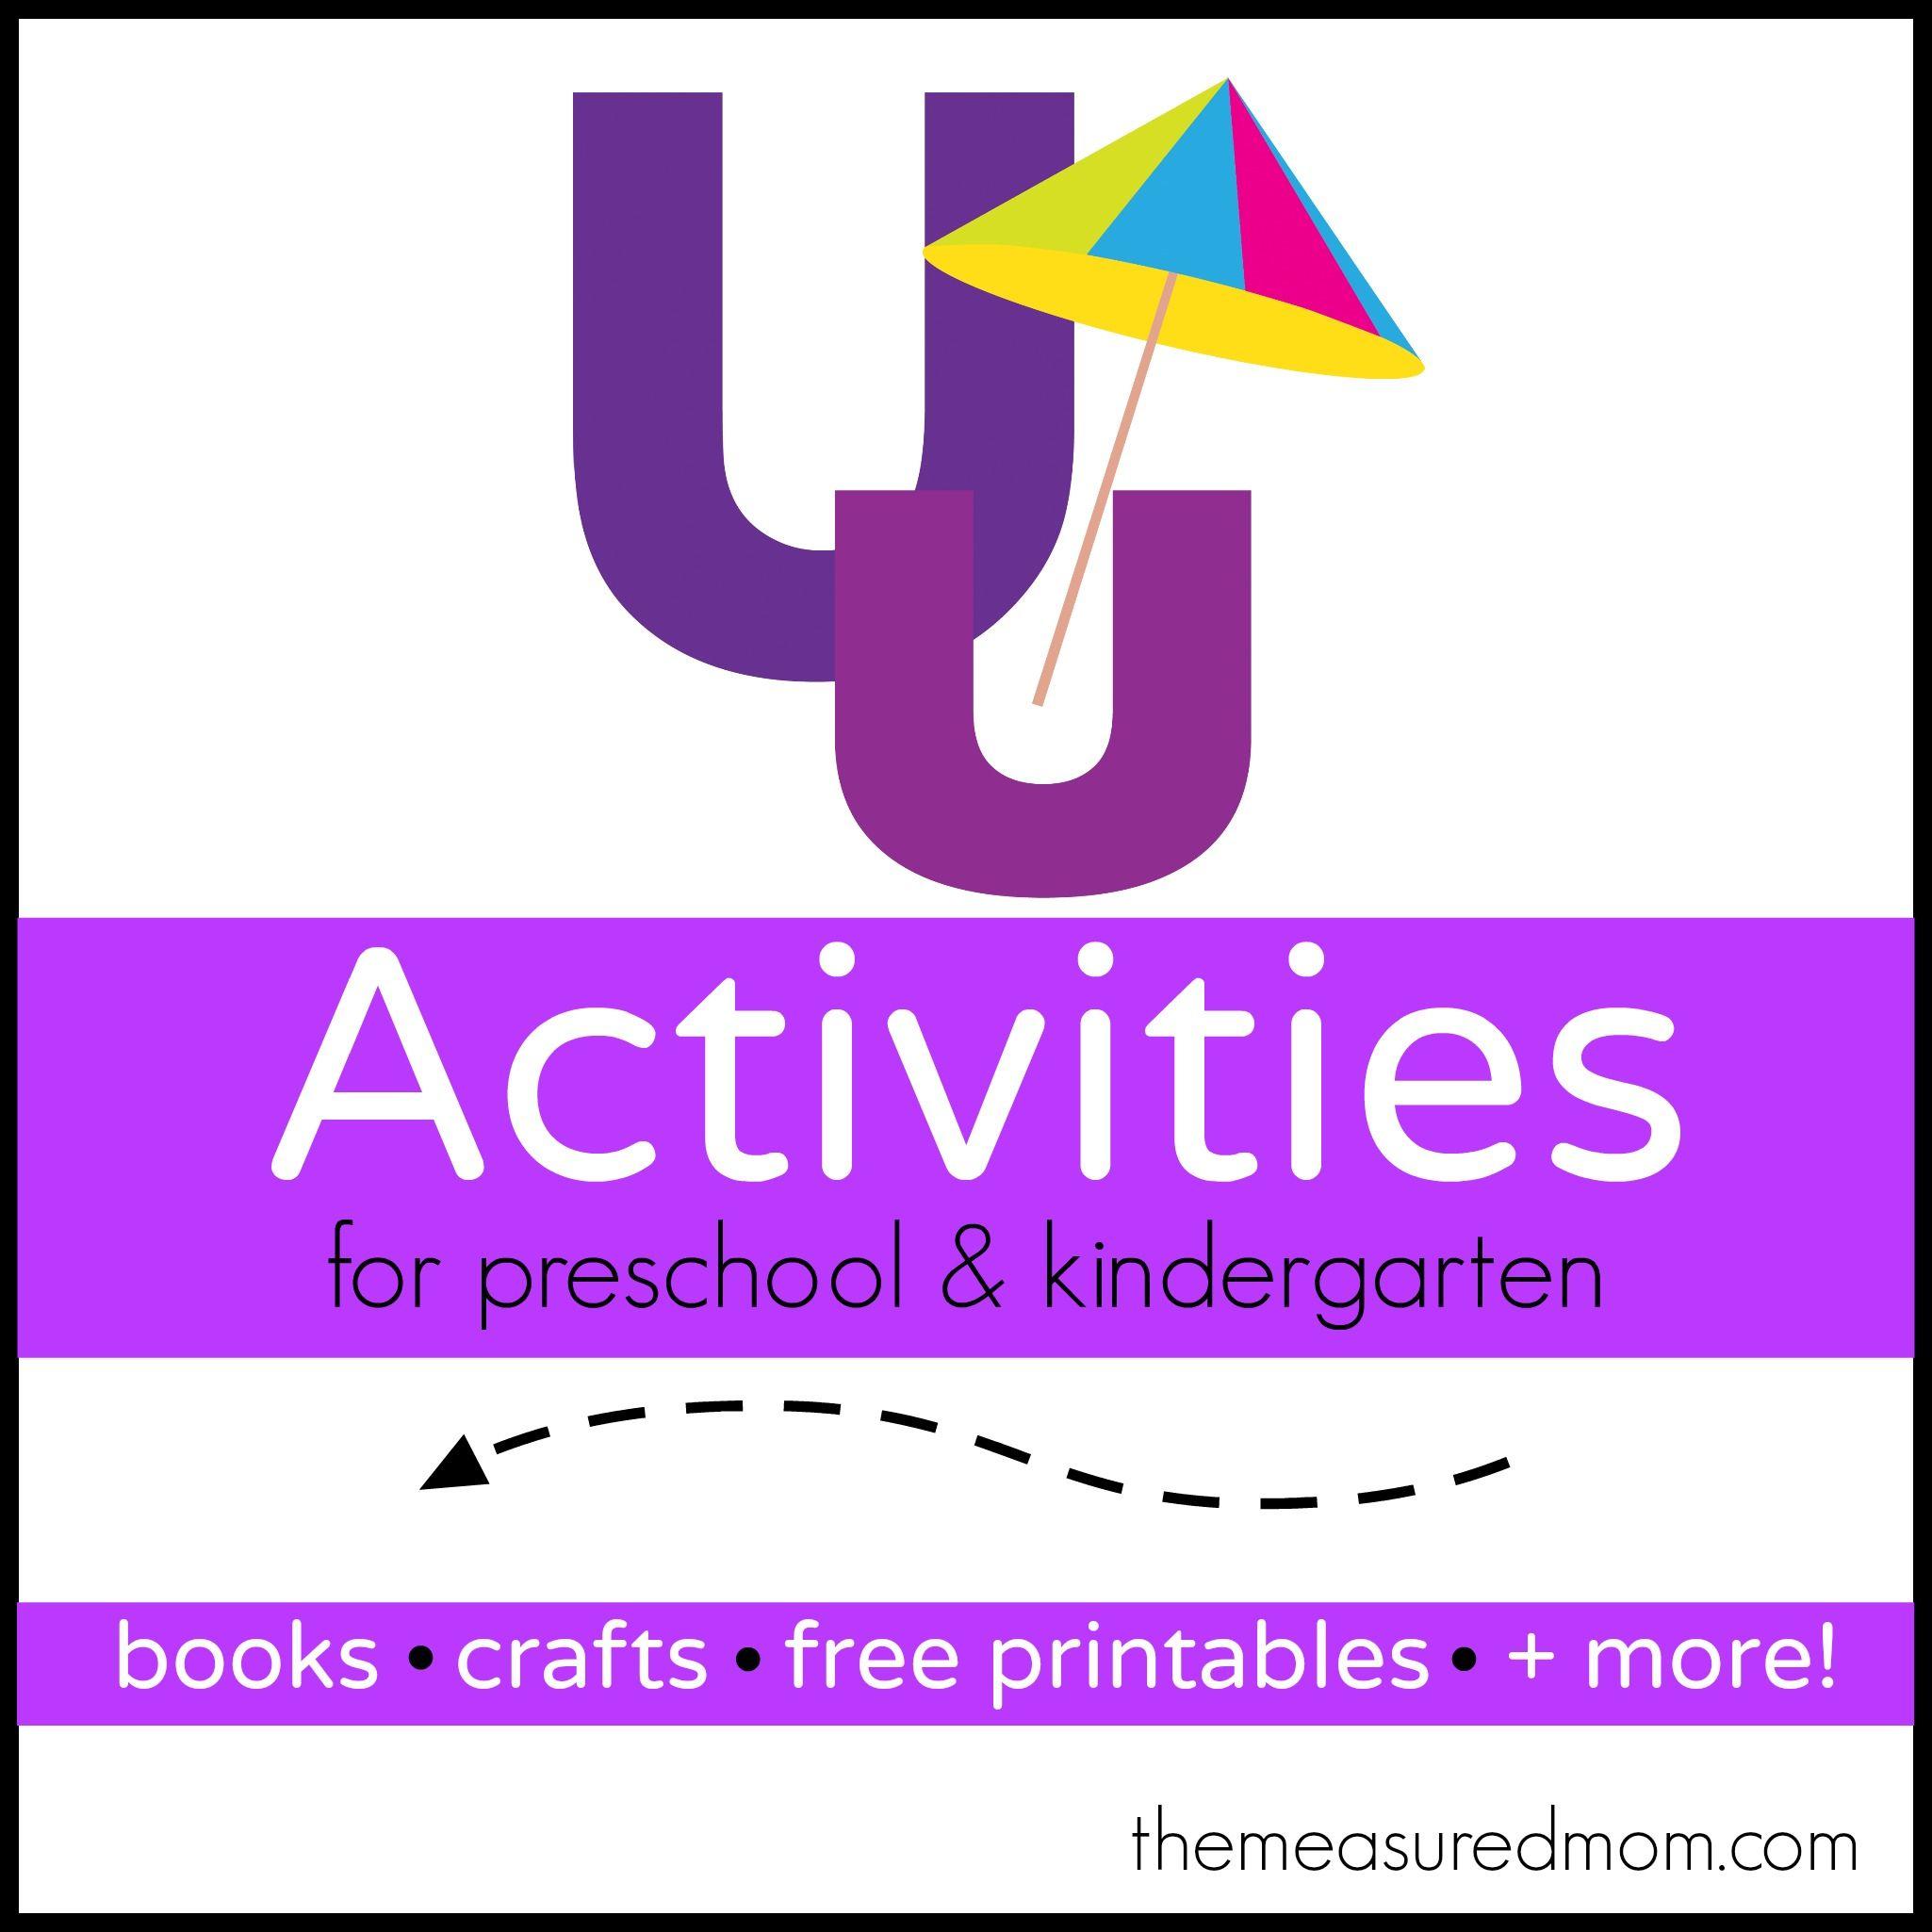 Lotw Letter U Activities The Measured Mom Teaching Preschoolers Letters Alphabet Worksheets Preschool Teaching The Alphabet [ 2050 x 2050 Pixel ]